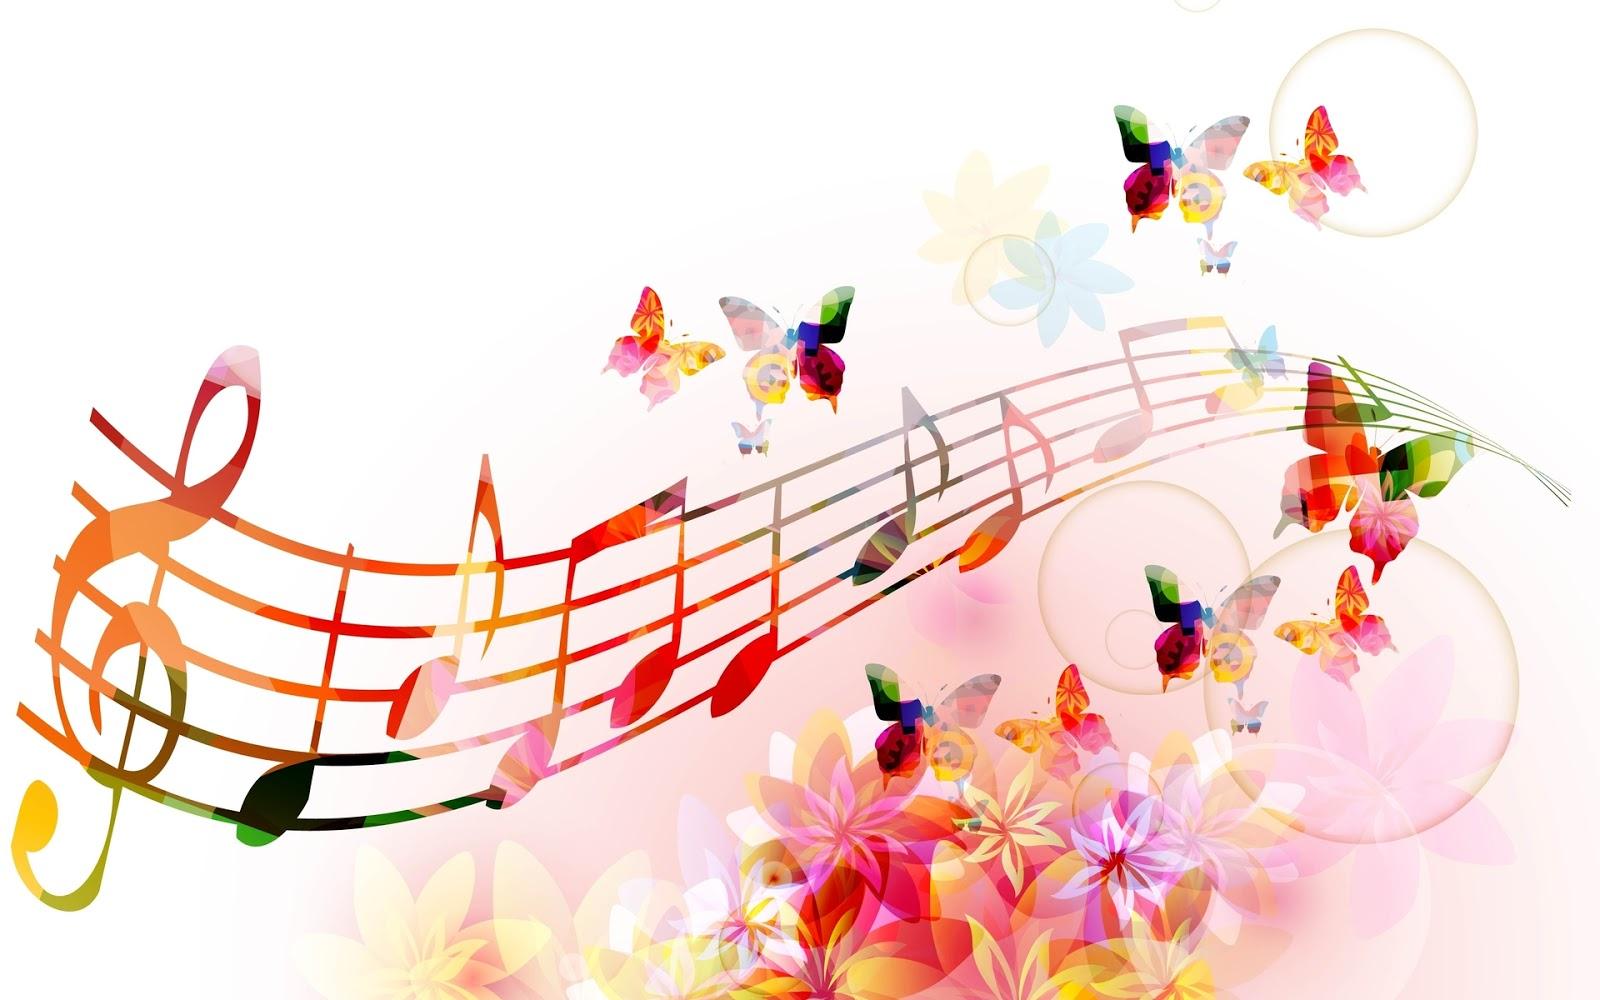 Mis Fondos Para Fotos Gratis: Fondo De Pantalla Abstracto Notas Musicales